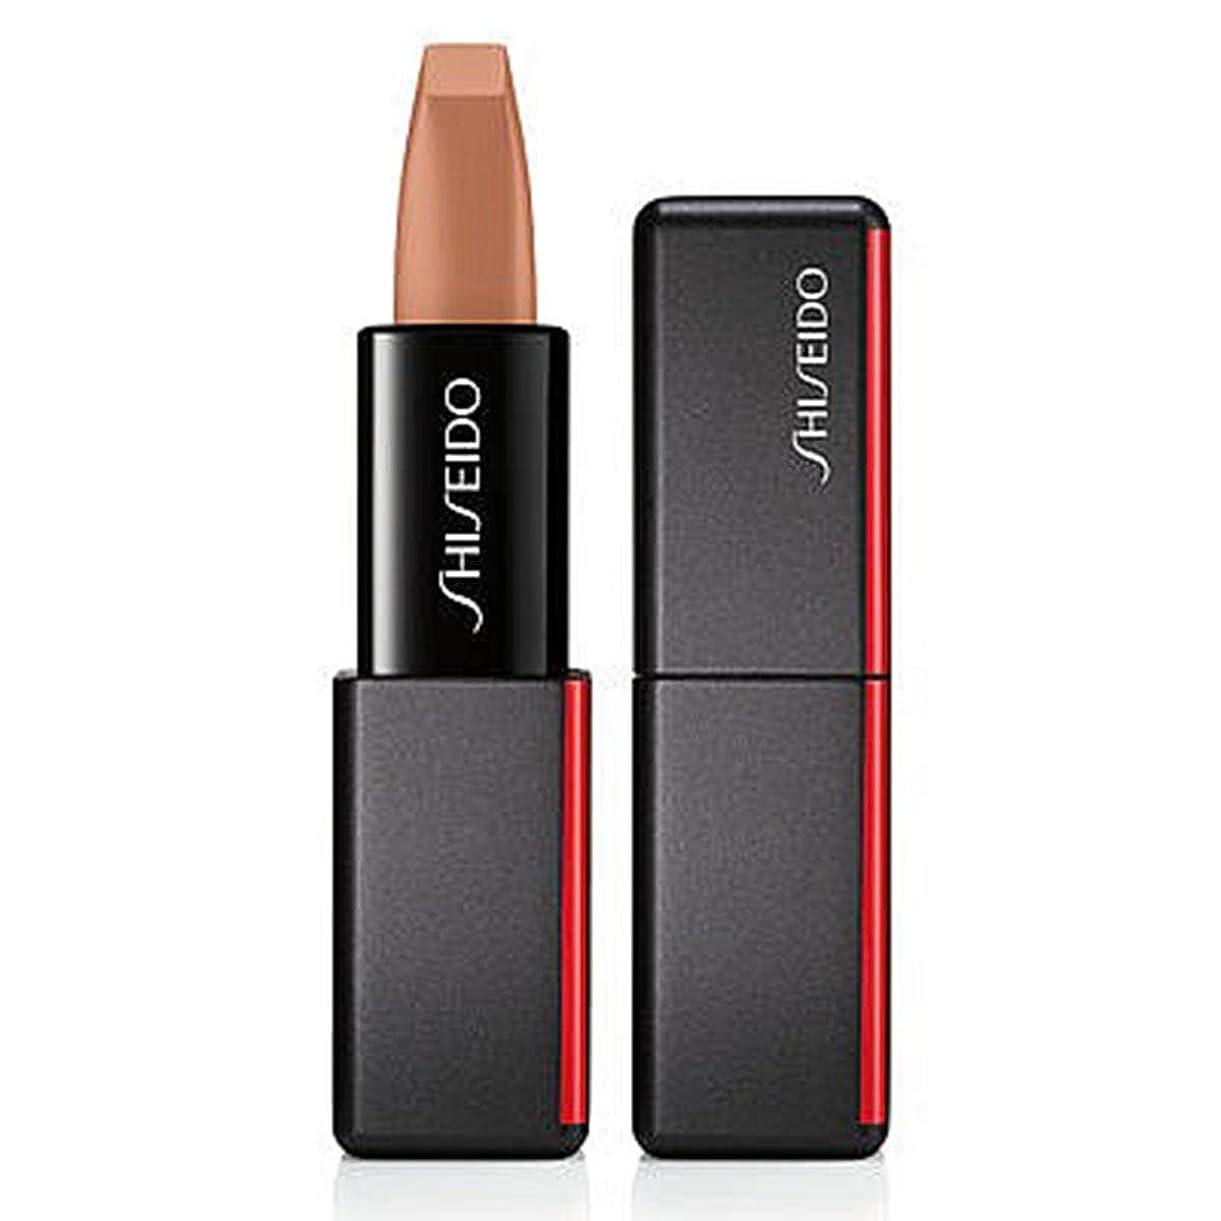 資生堂 ModernMatte Powder Lipstick - # 503 Nude Streak (Caramel) 4g/0.14oz並行輸入品